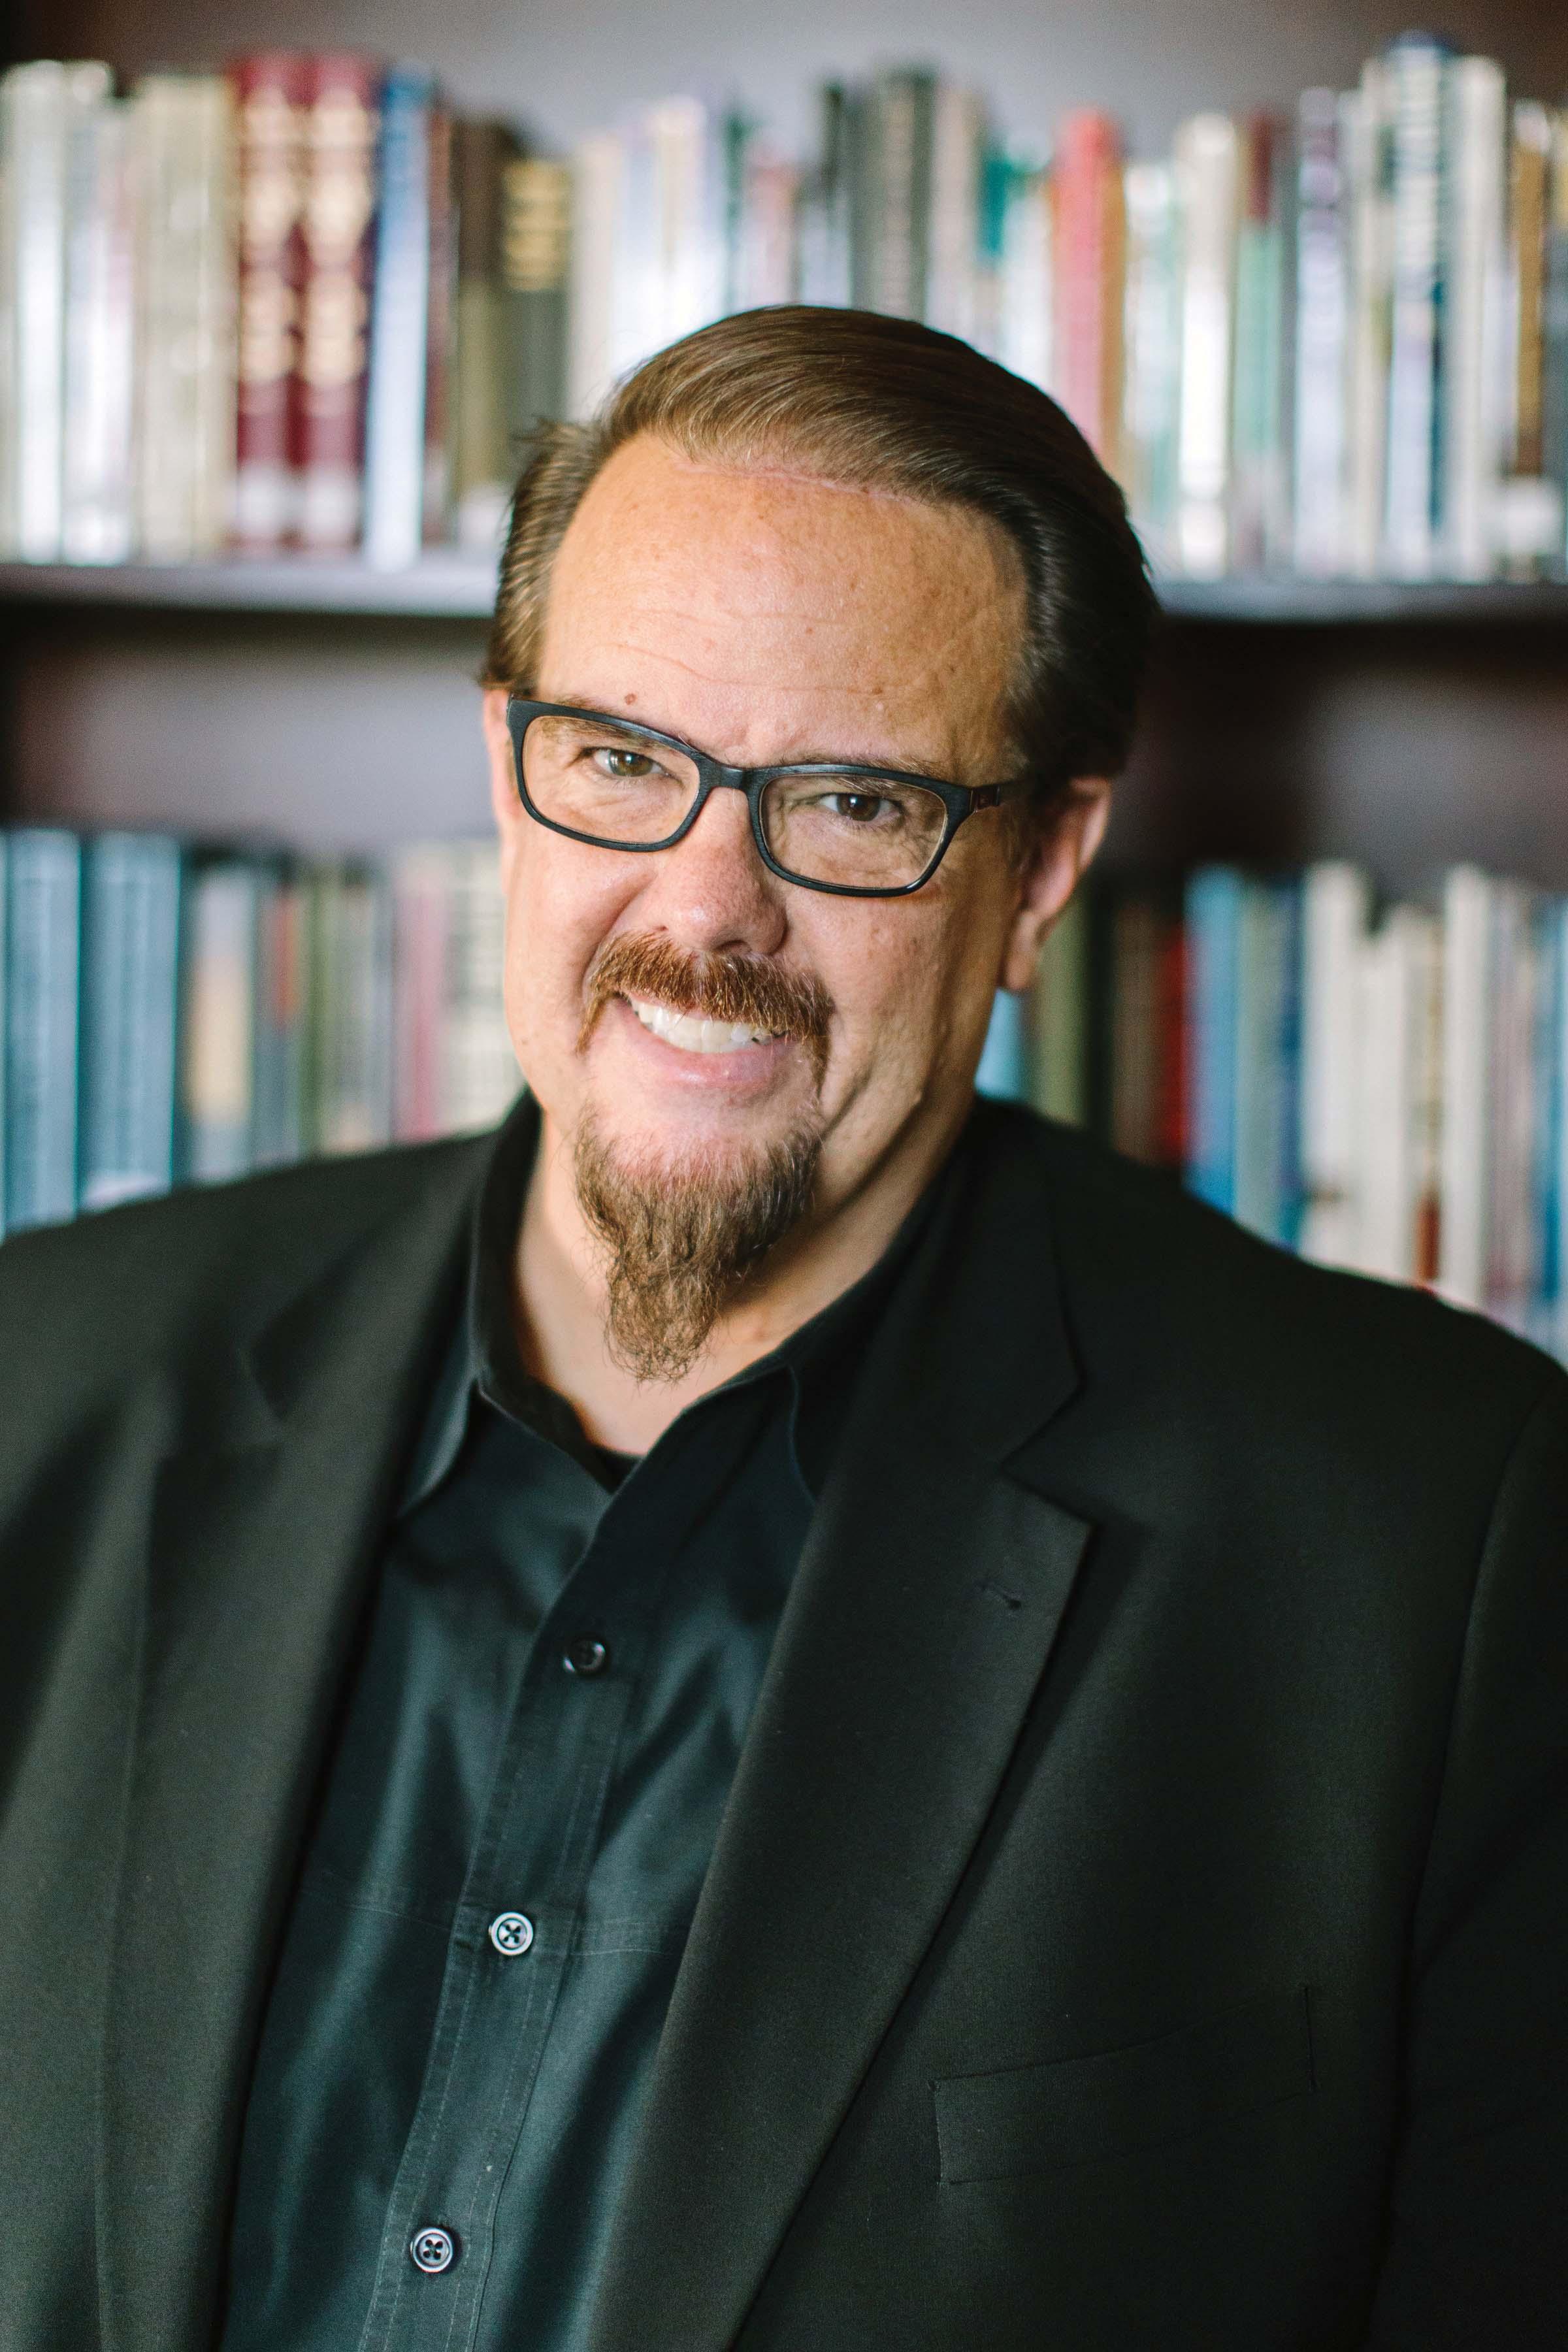 ED STETZER Researcher, Pastor, Missiologist